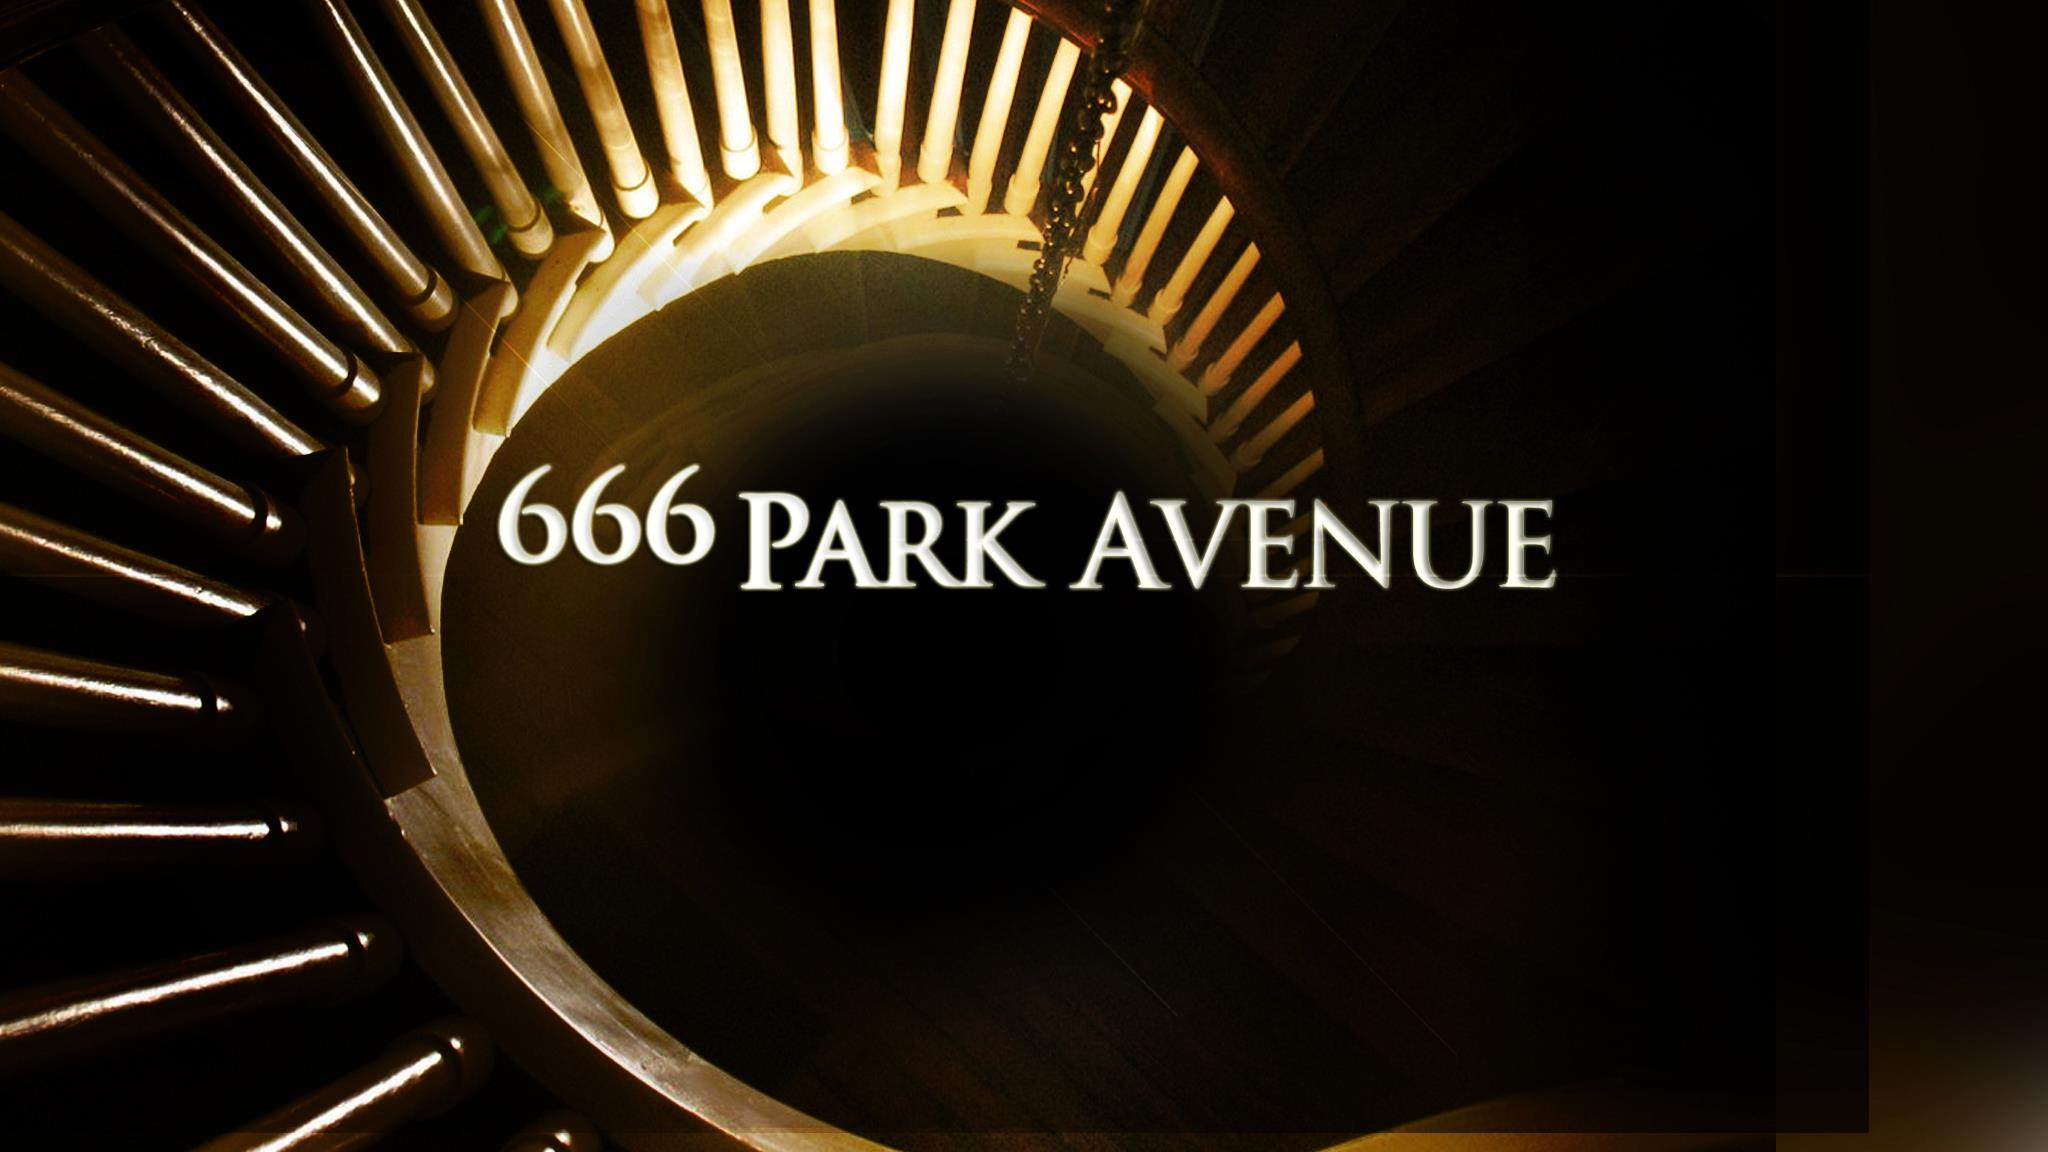 666 Park Avenue wallpaper - 666 Park Avenue Wallpaper ...